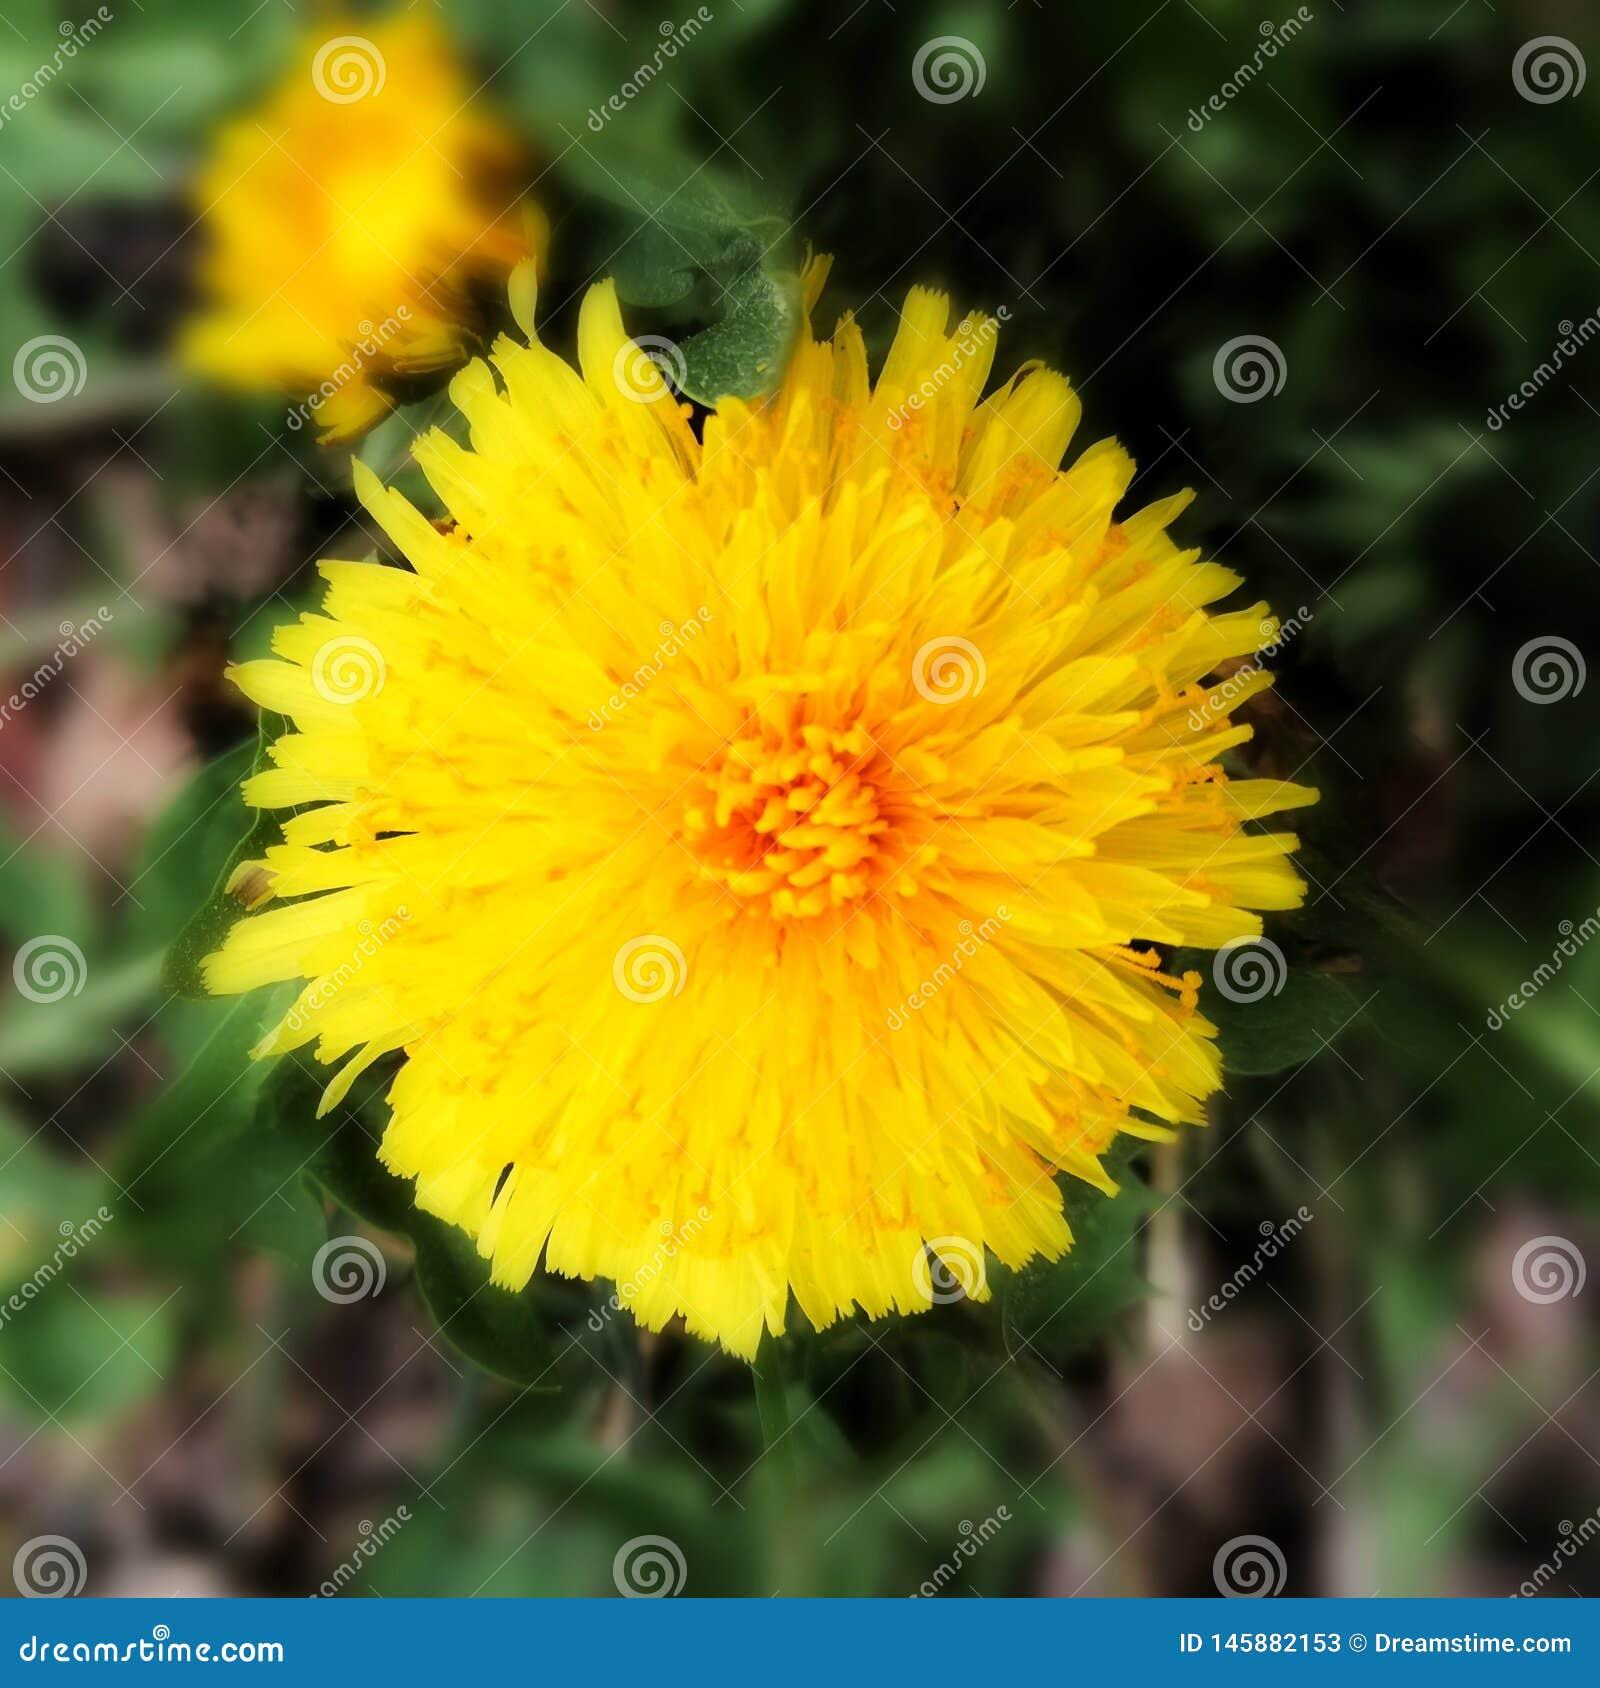 Closeup of a dandelion blossoming